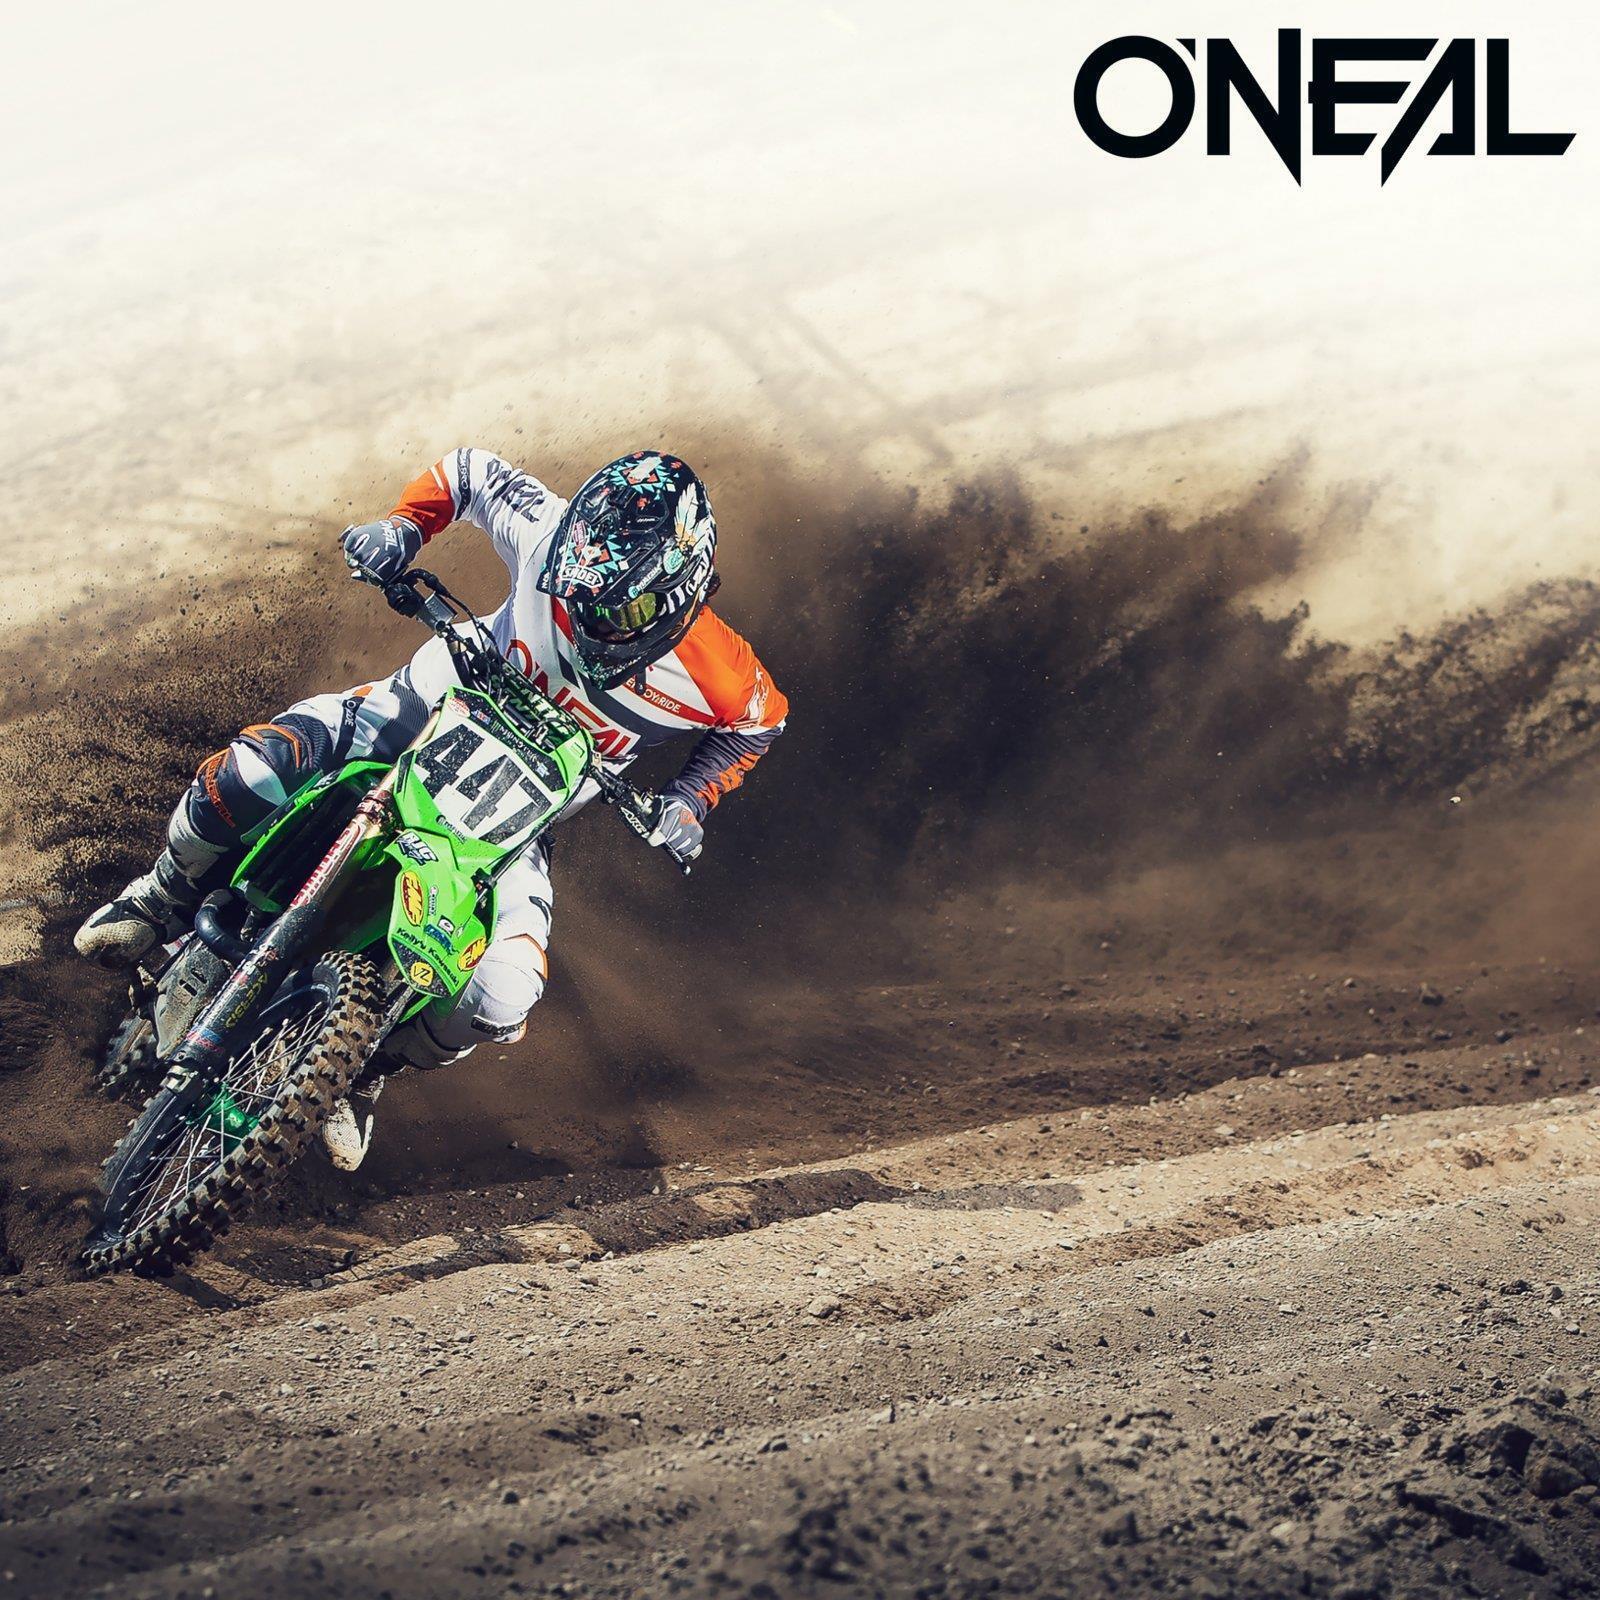 O'Neal Motorrad Hardwear Rizer Motocross Jersey MX Enduro Motorrad O'Neal Trikot Mountain Bike 376791